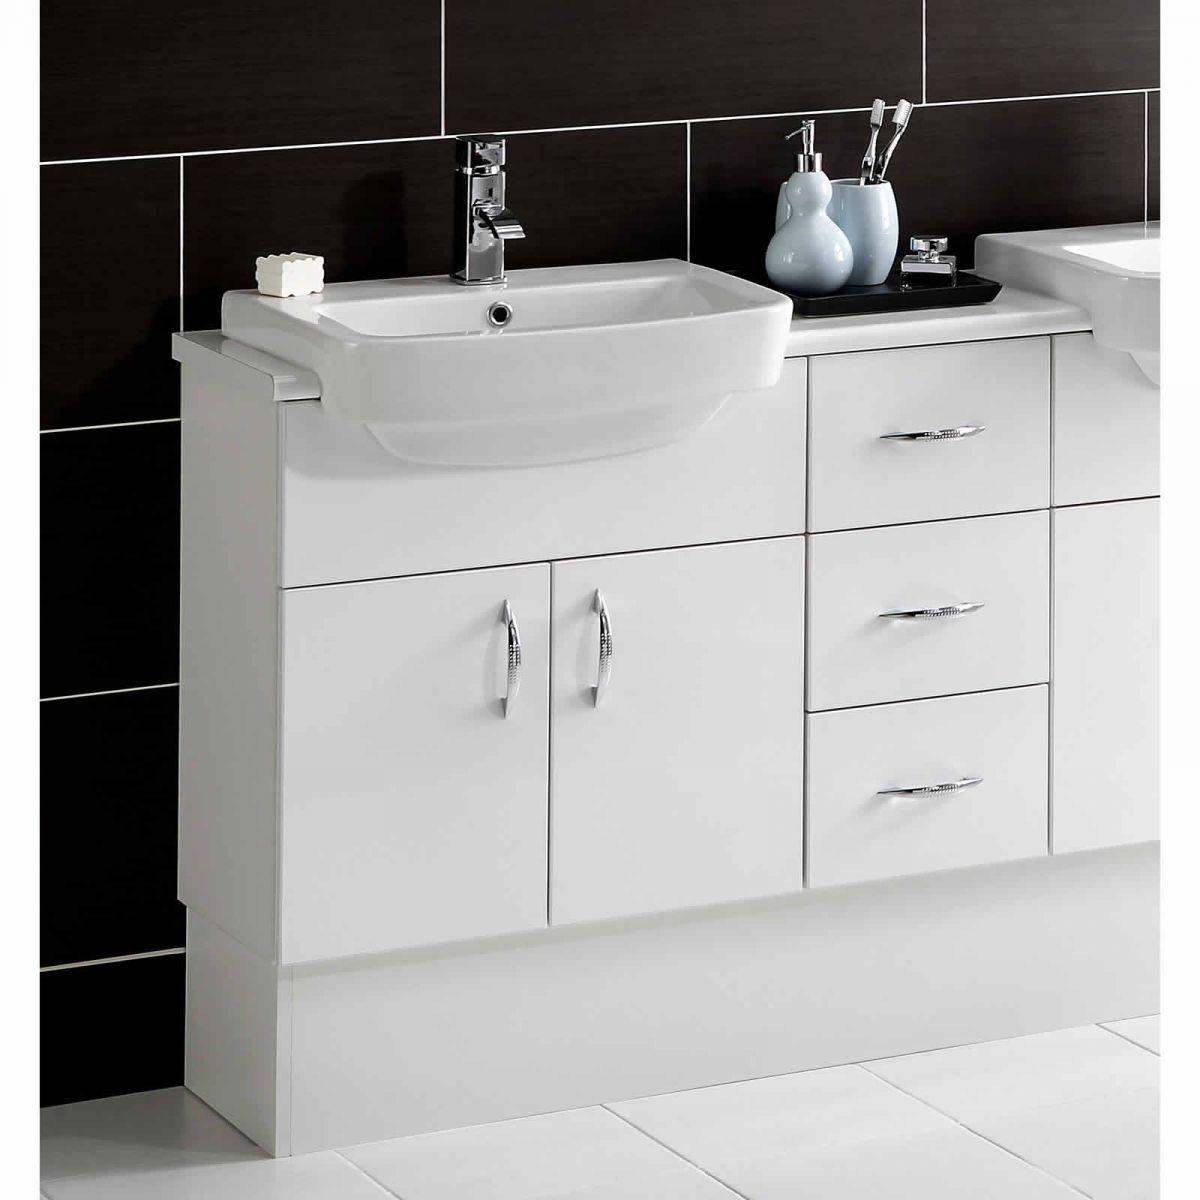 Original Home Furniture Amp DIY Gt Bath Gt Bathroom Suites Gt Other Bathroom